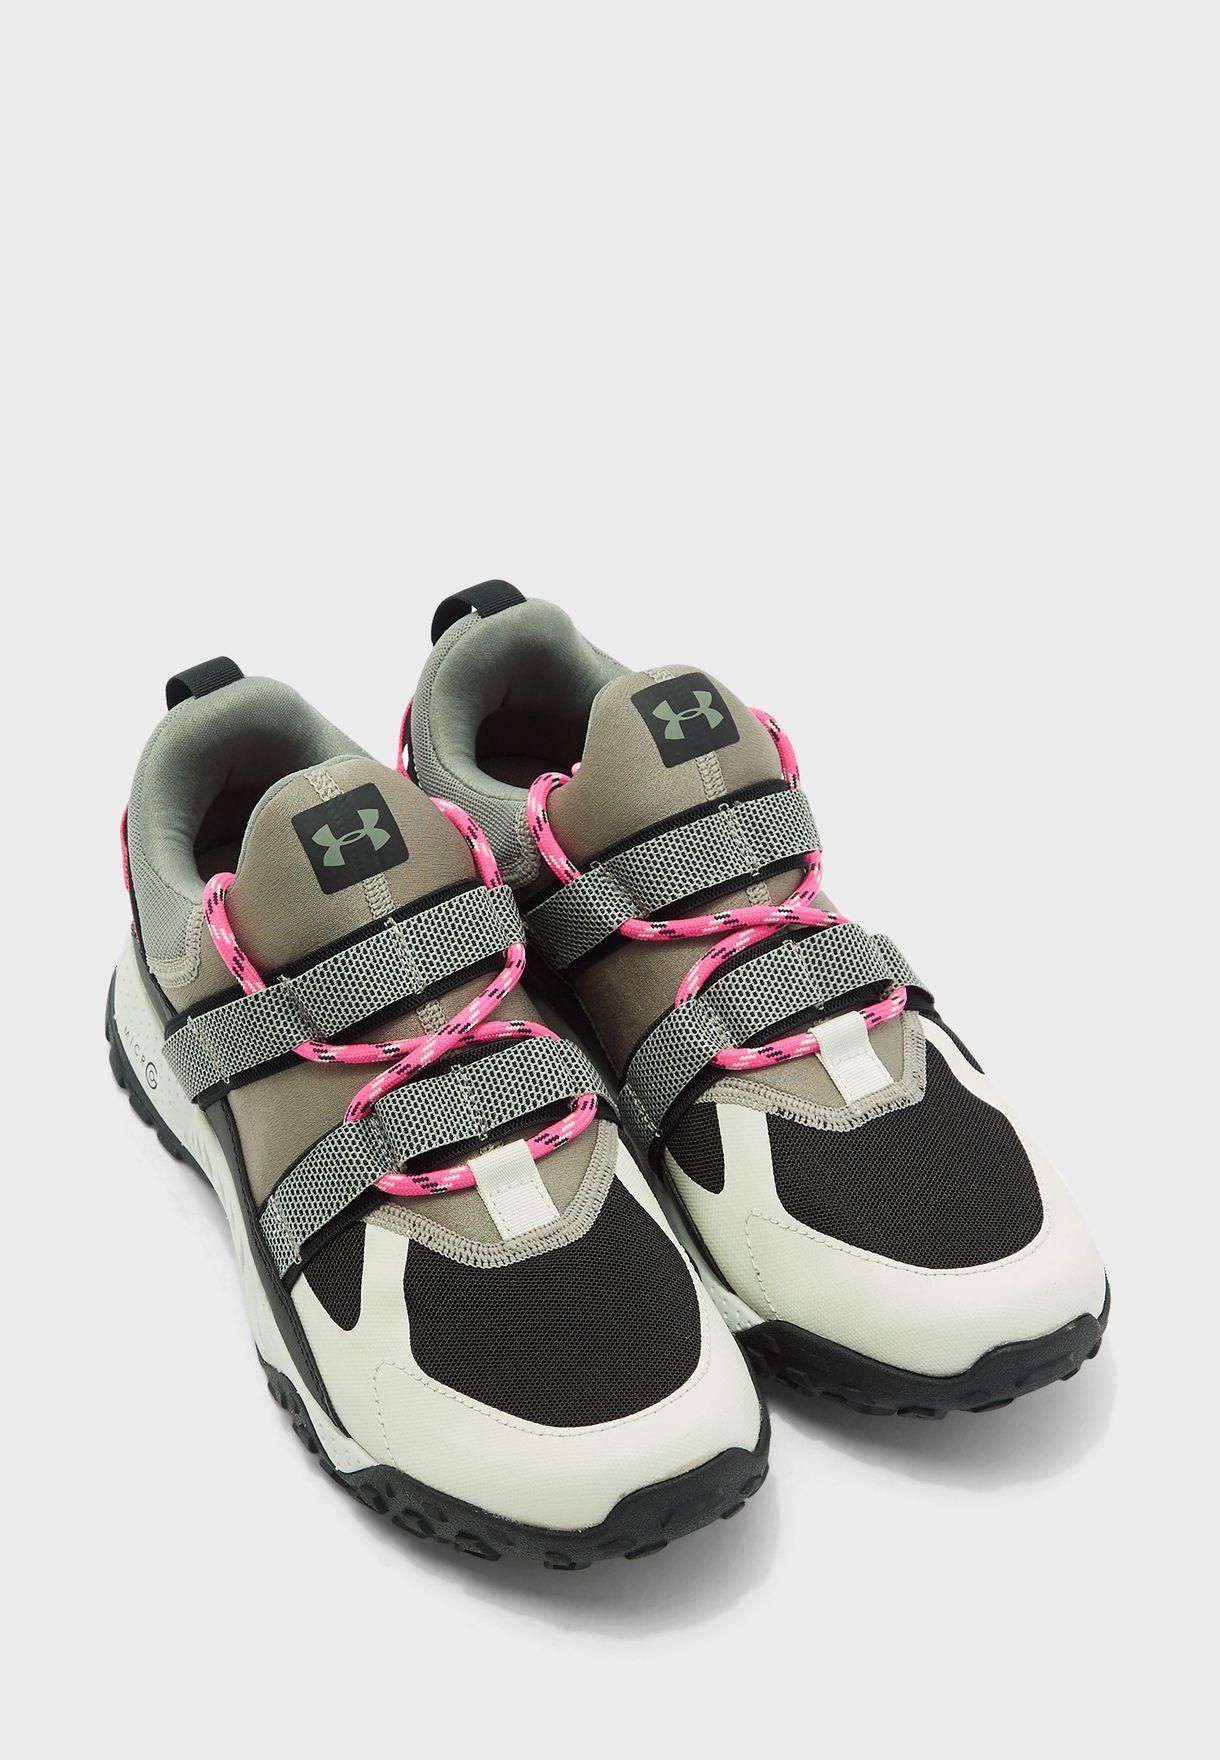 حذاء فالسيتز تريك ان ام